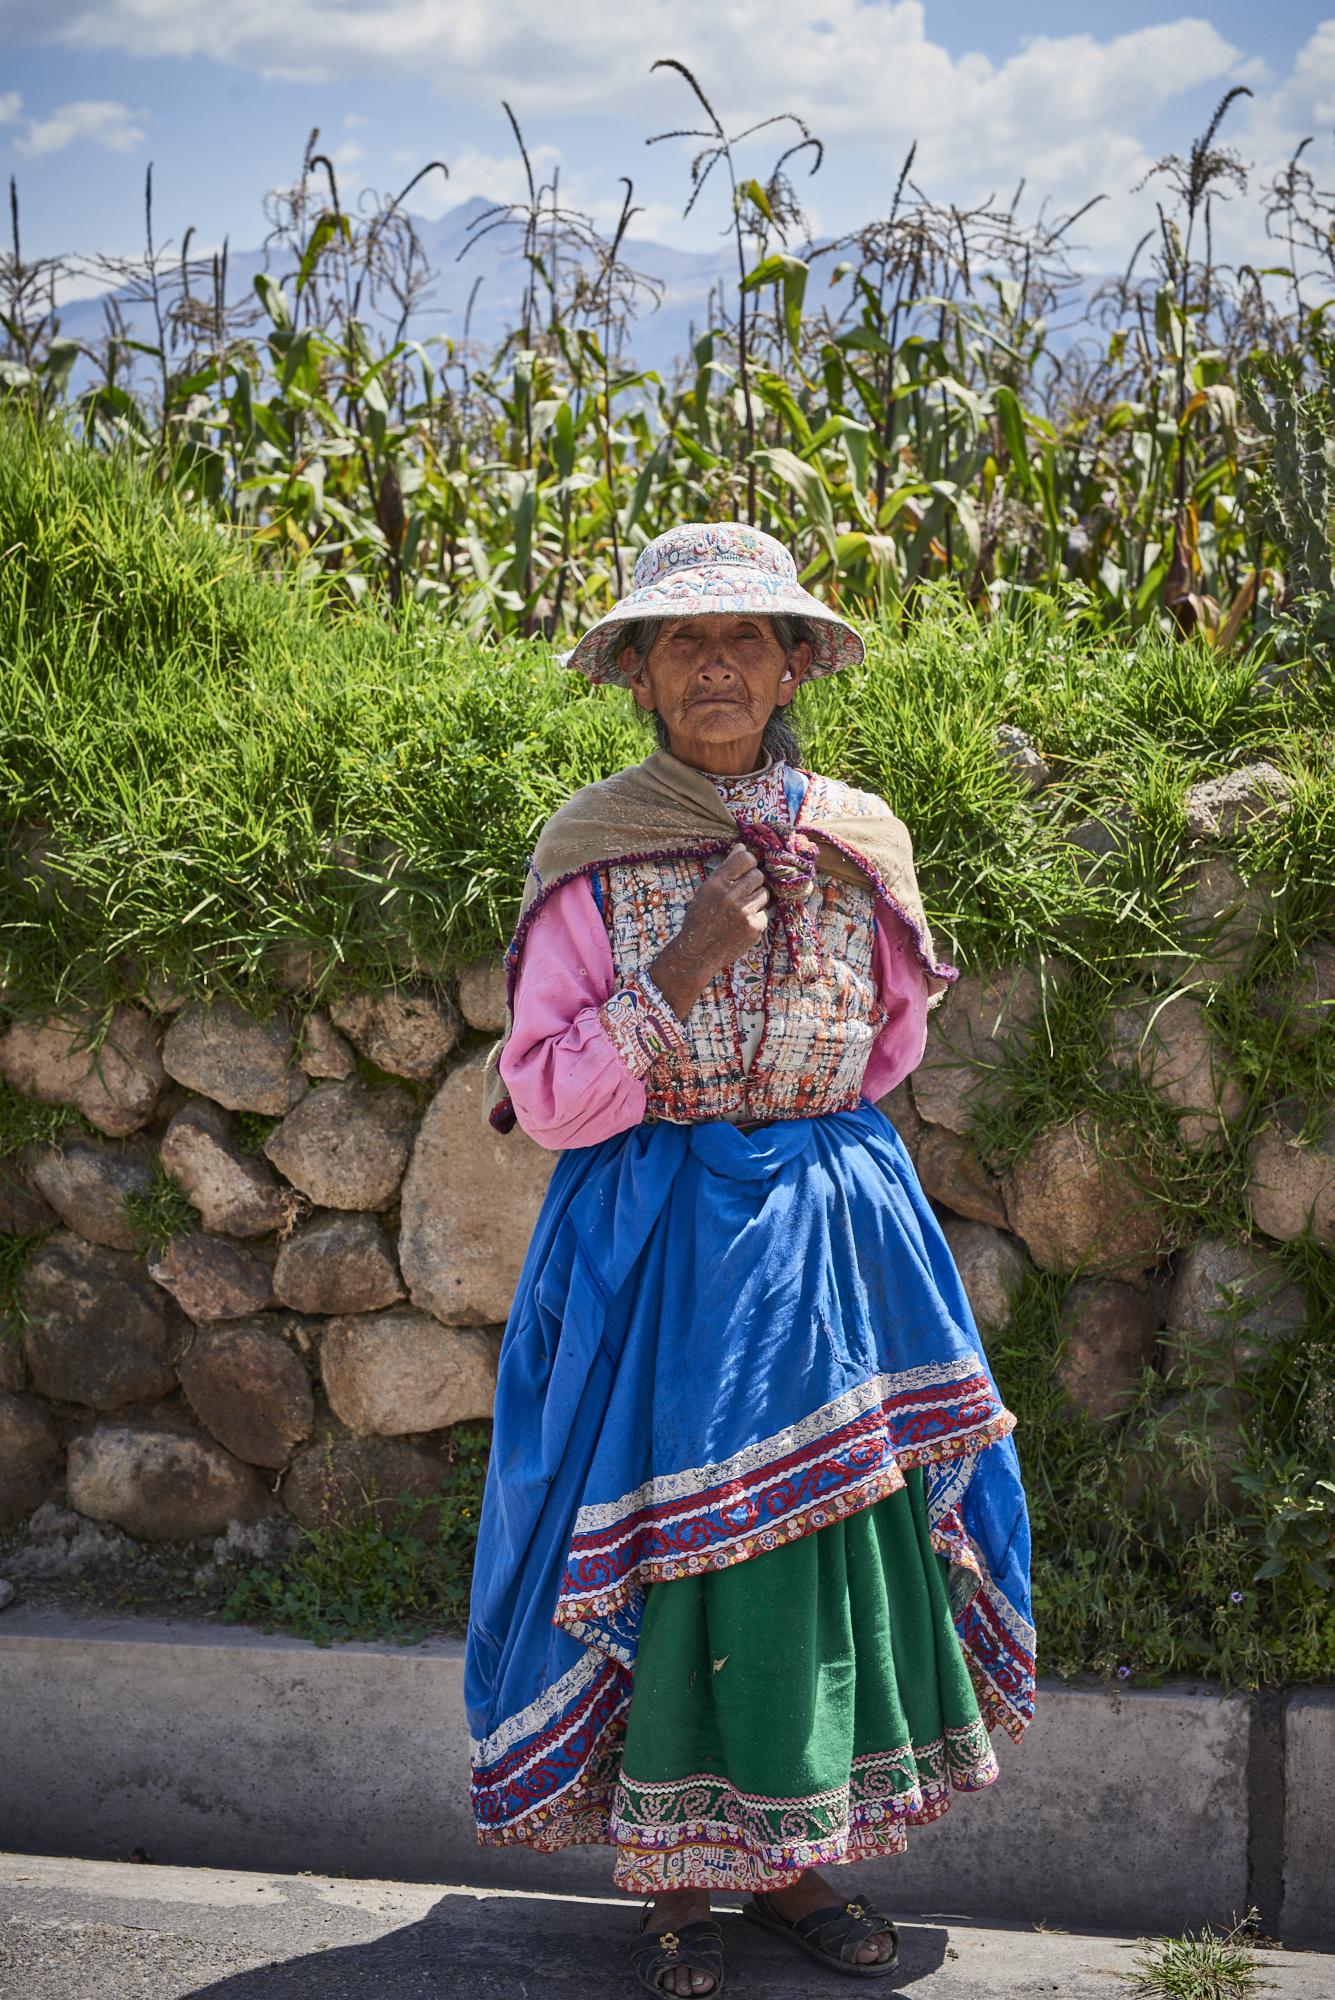 170408_Peru_ColcaCanyon_143 3.jpg